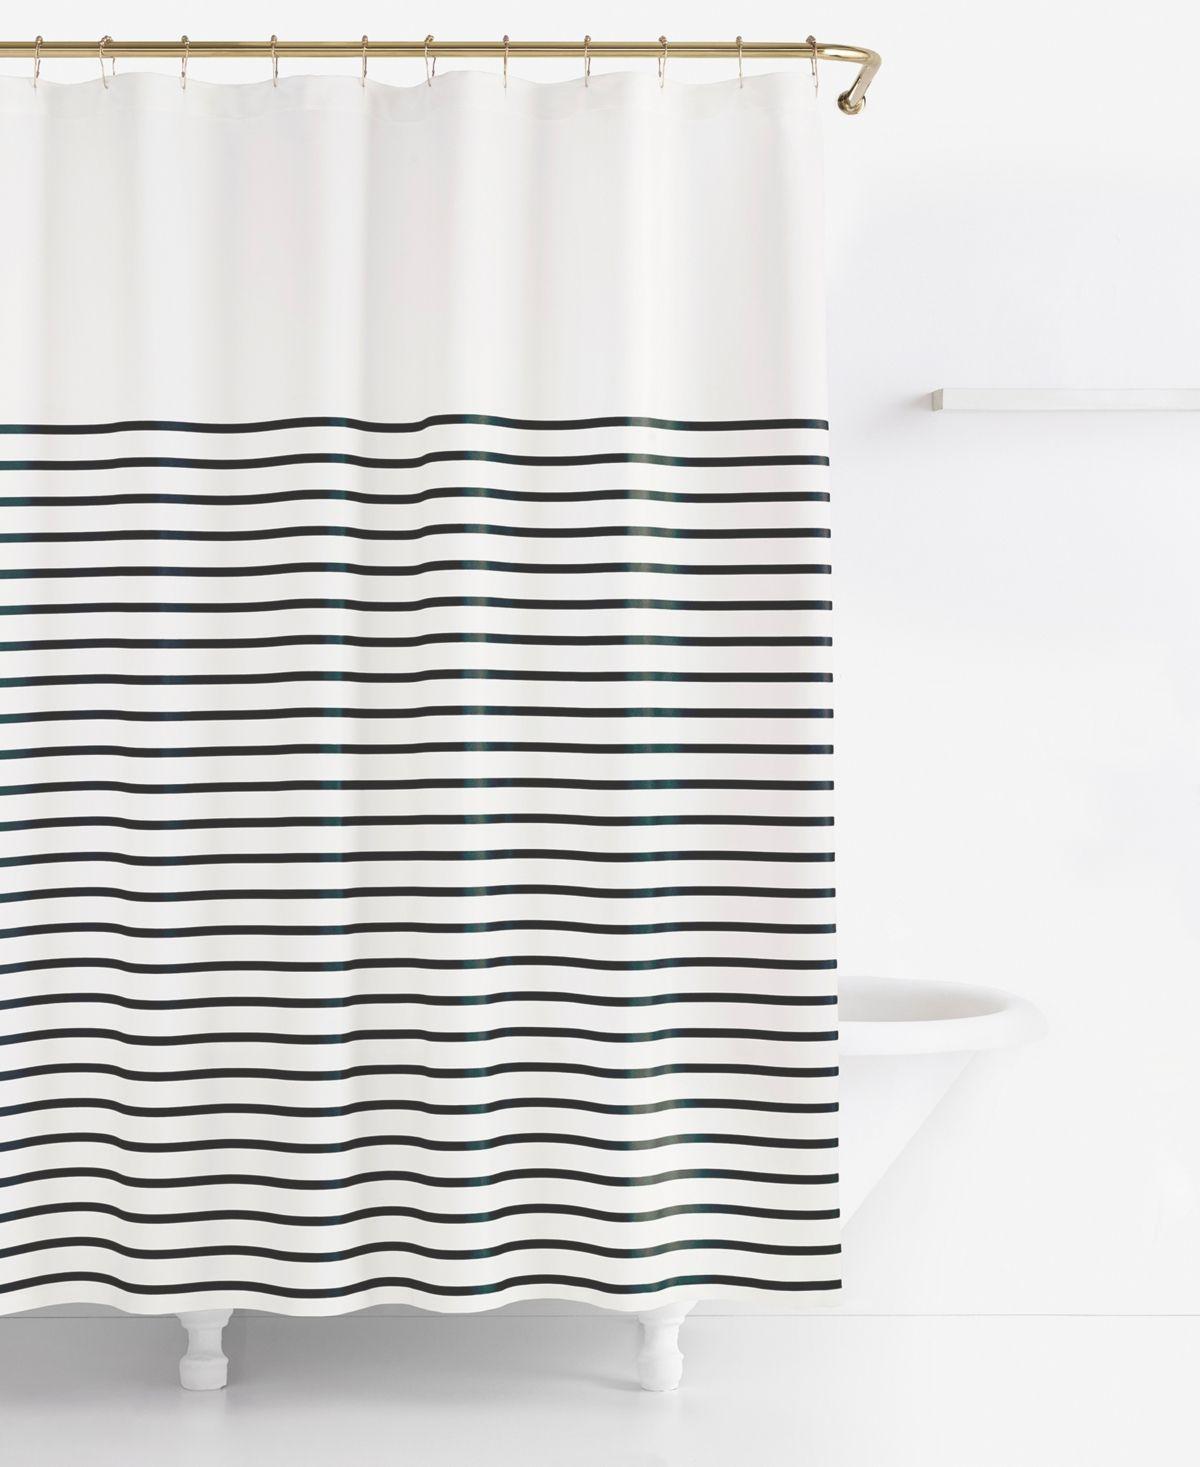 Kate Spade New York Harbour Stripe Shower Curtain Navy In 2020